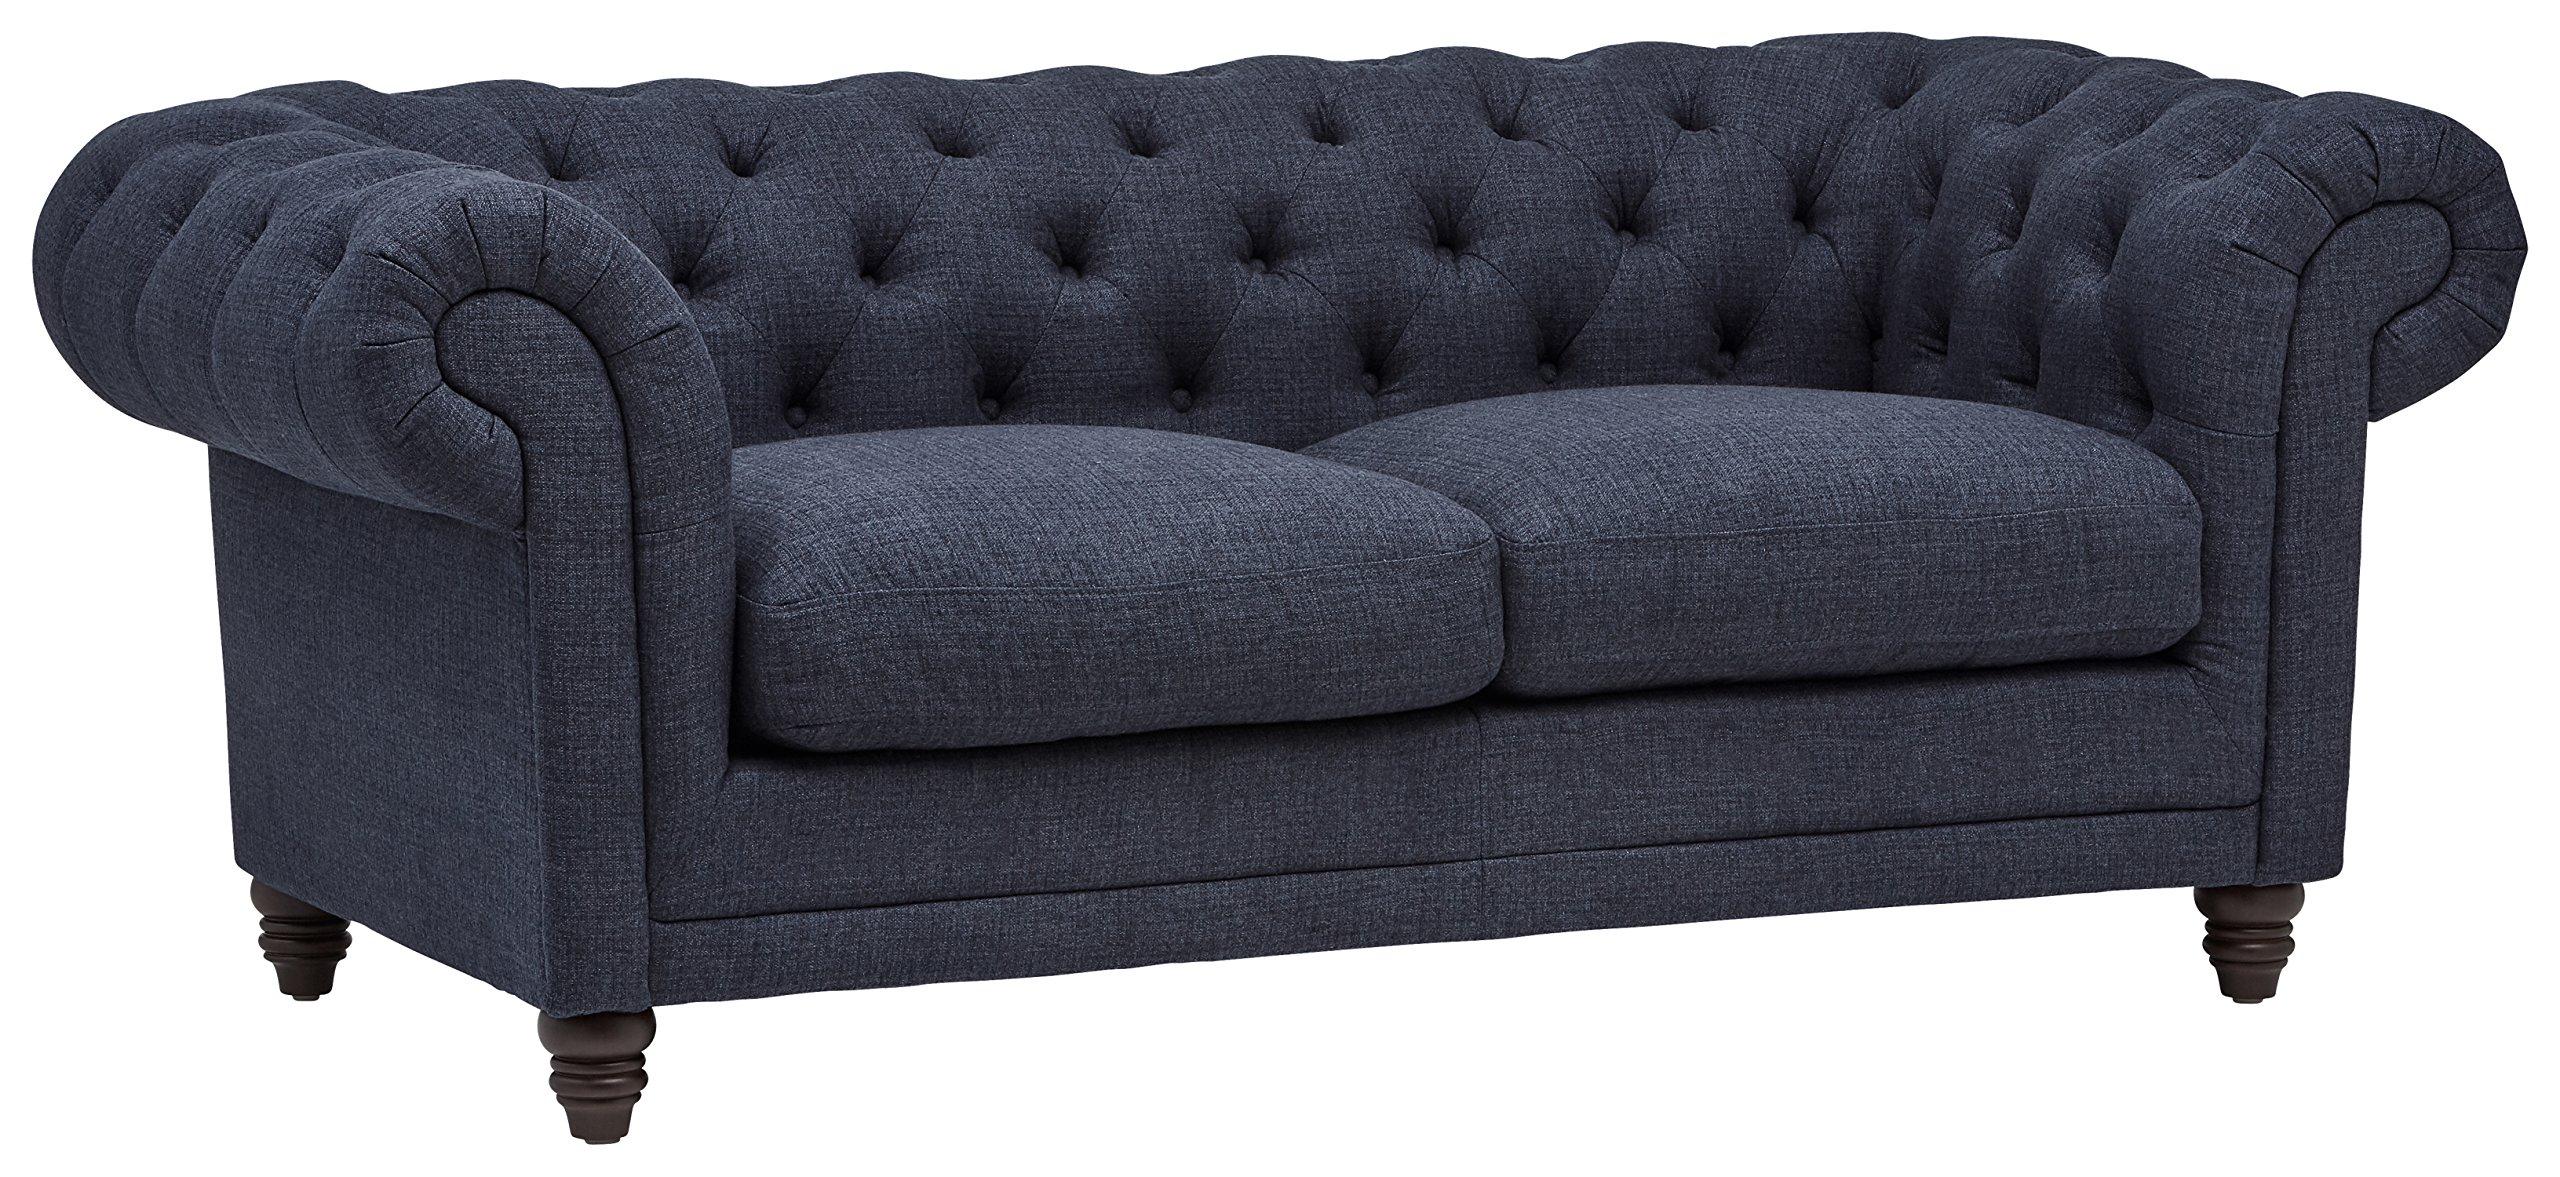 Stone & Beam Bradbury Chesterfield Tufted Sofa, 79''W, Navy